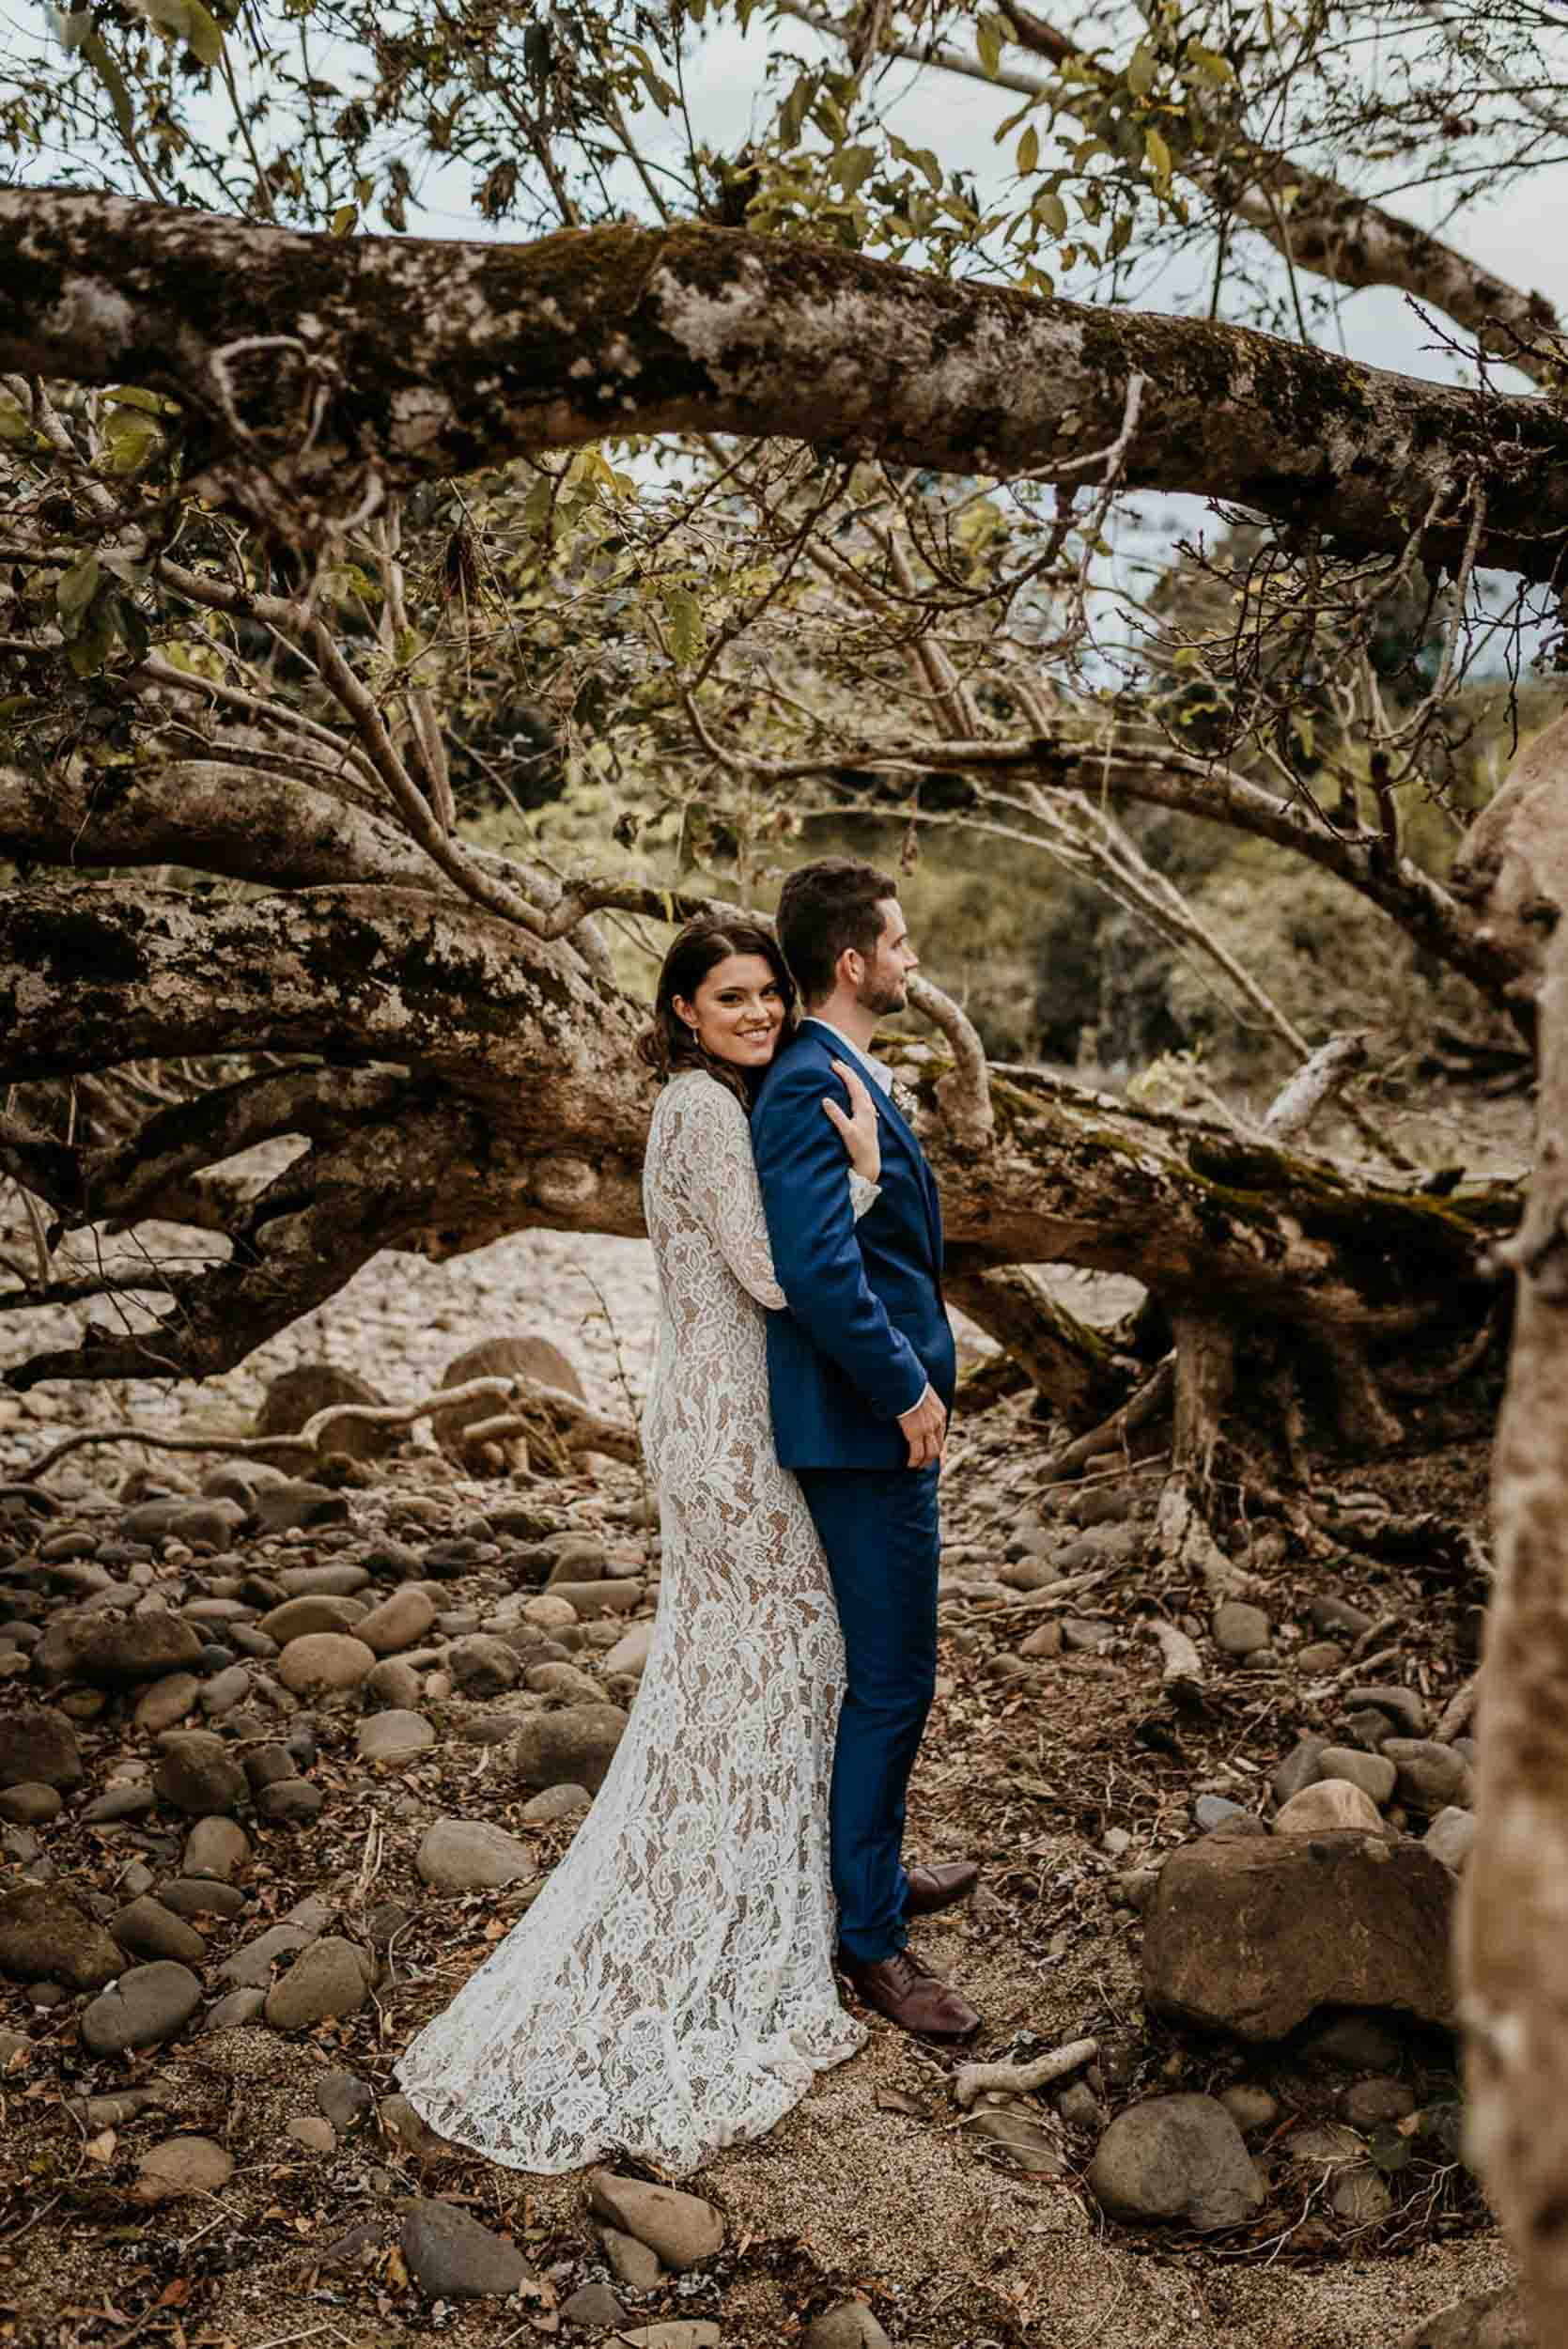 The Raw Photographer - Cairns Wedding Photographer - Laloli - Cairns Garden Wedding - Irene Costa's Devine Bridal-36.jpg